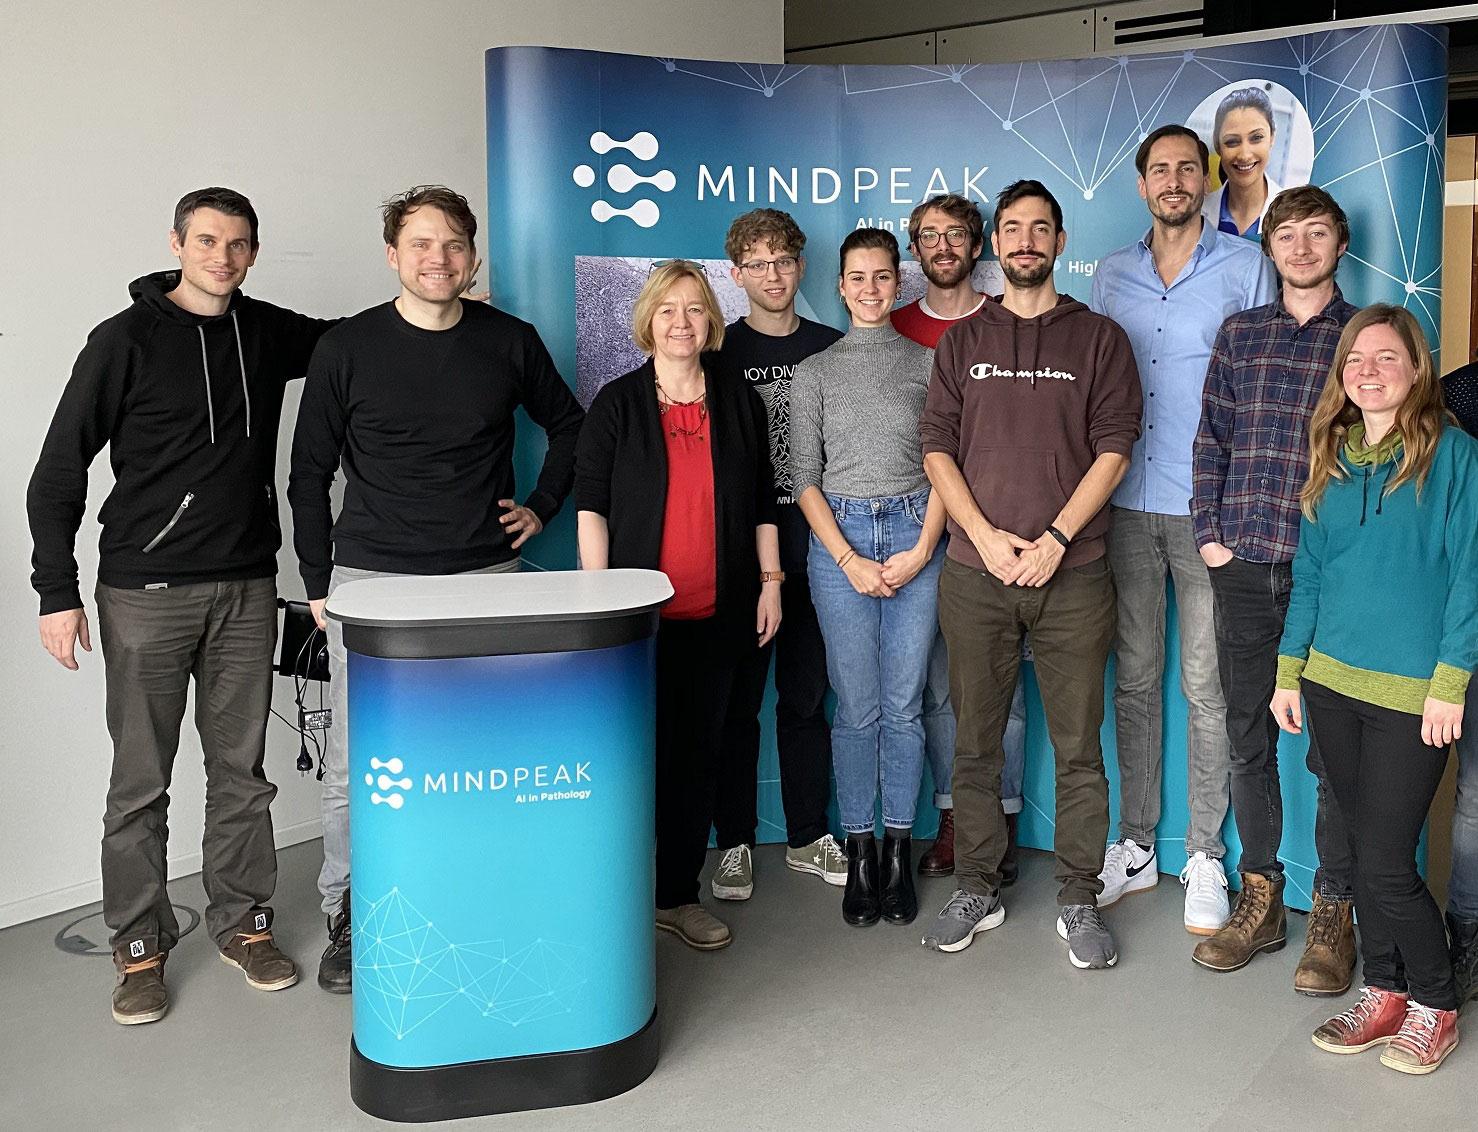 Mindpeak selected as one of the top 10 German Startups